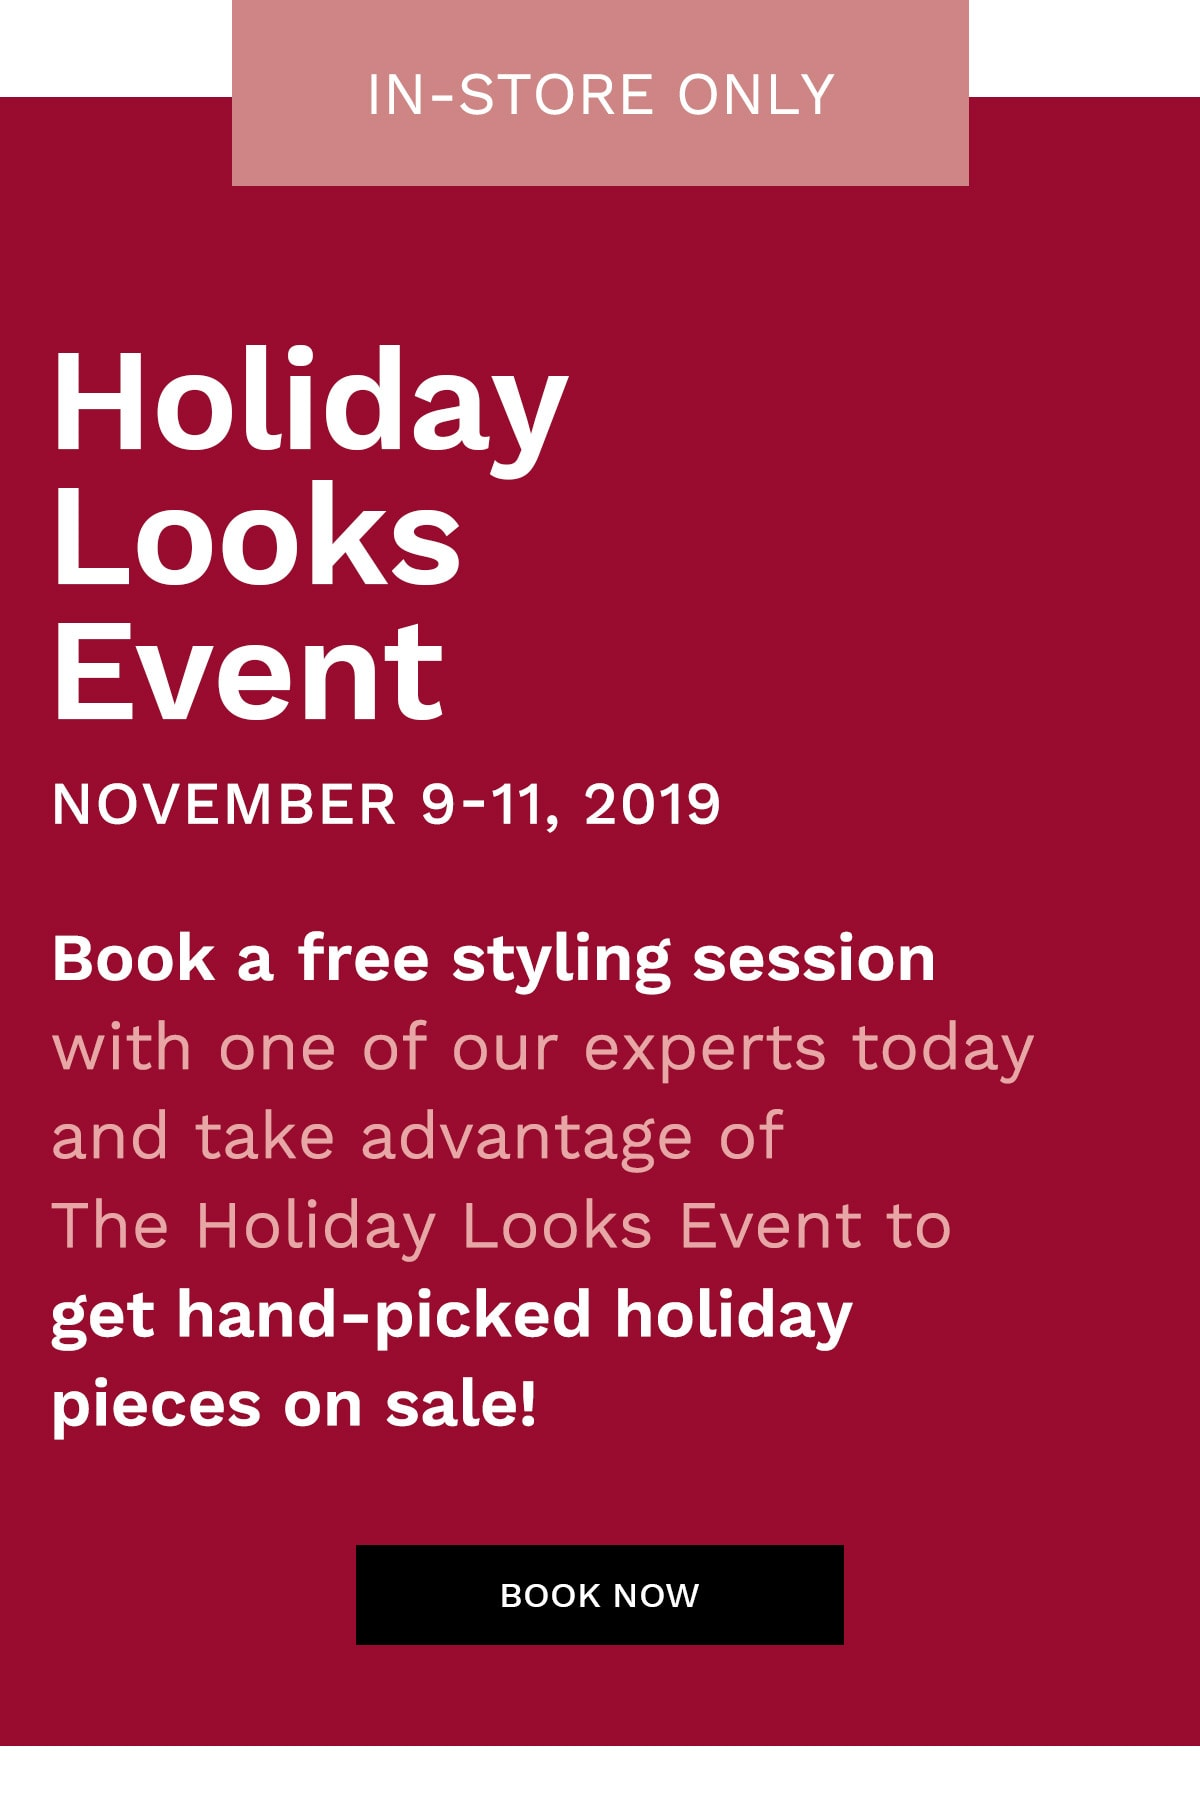 Holiday Looks Event November 9-11, 2019